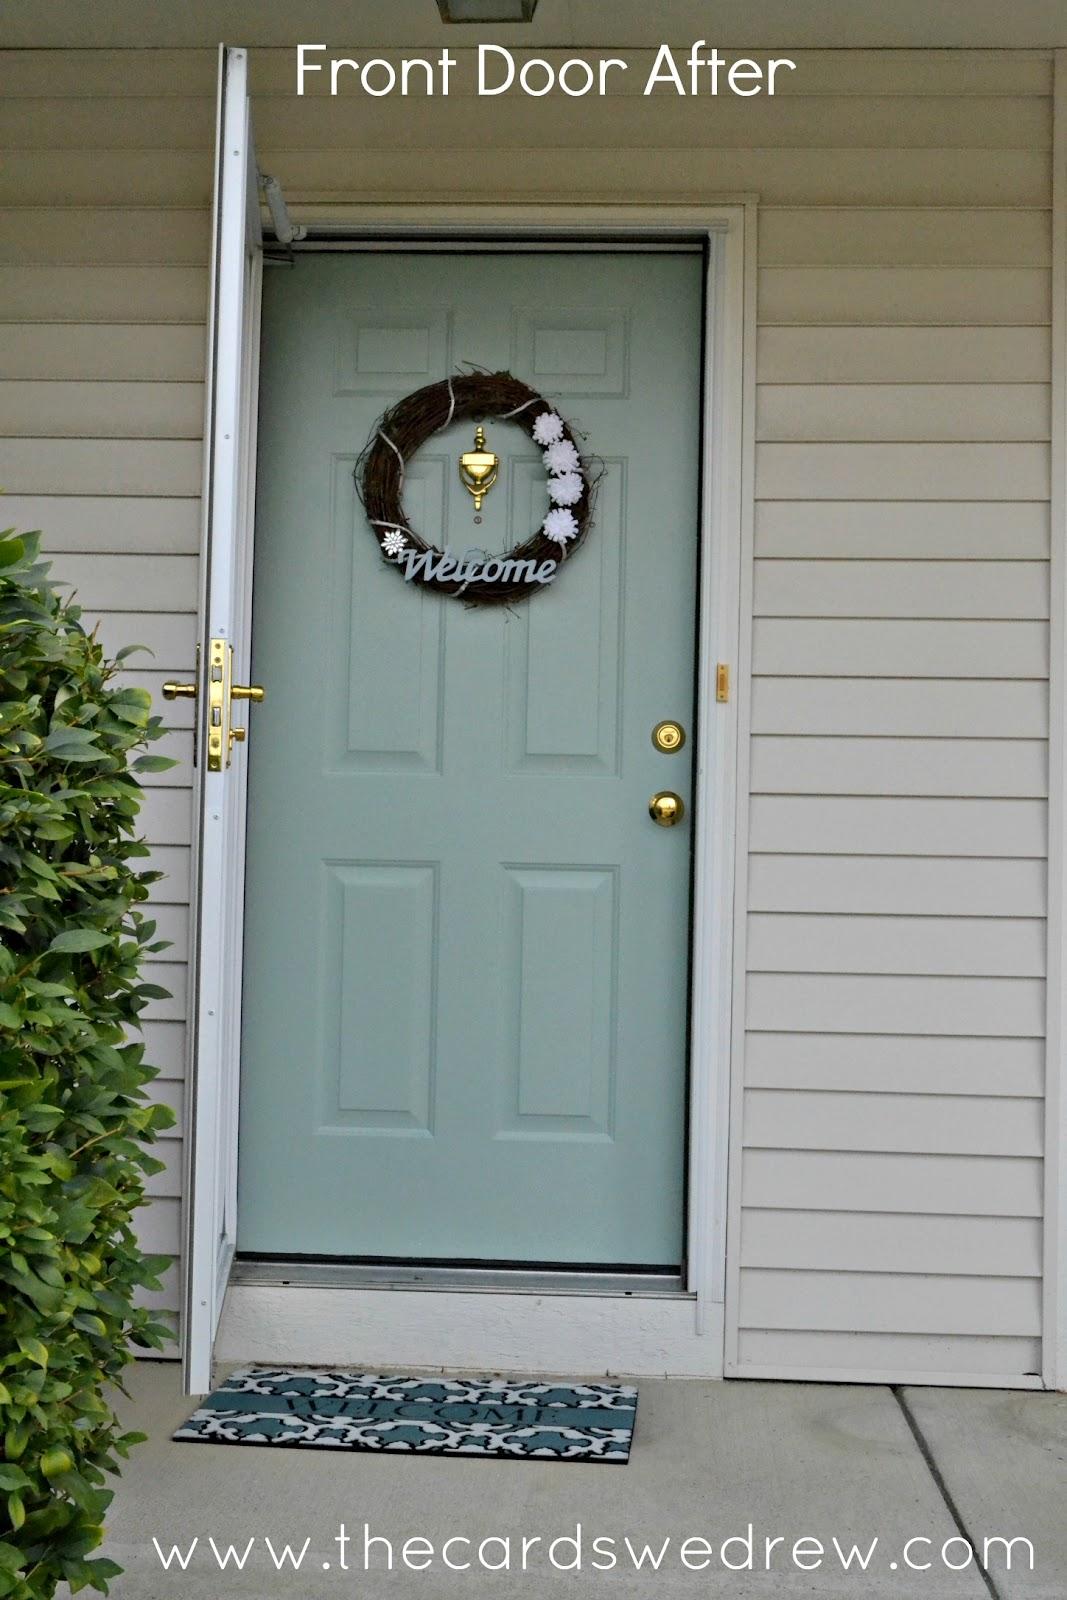 1600 #4C5E34 Front Door Color! Soo Pretty!!! Irwin Road Pinterest pic Colorful Front Doors 47111067